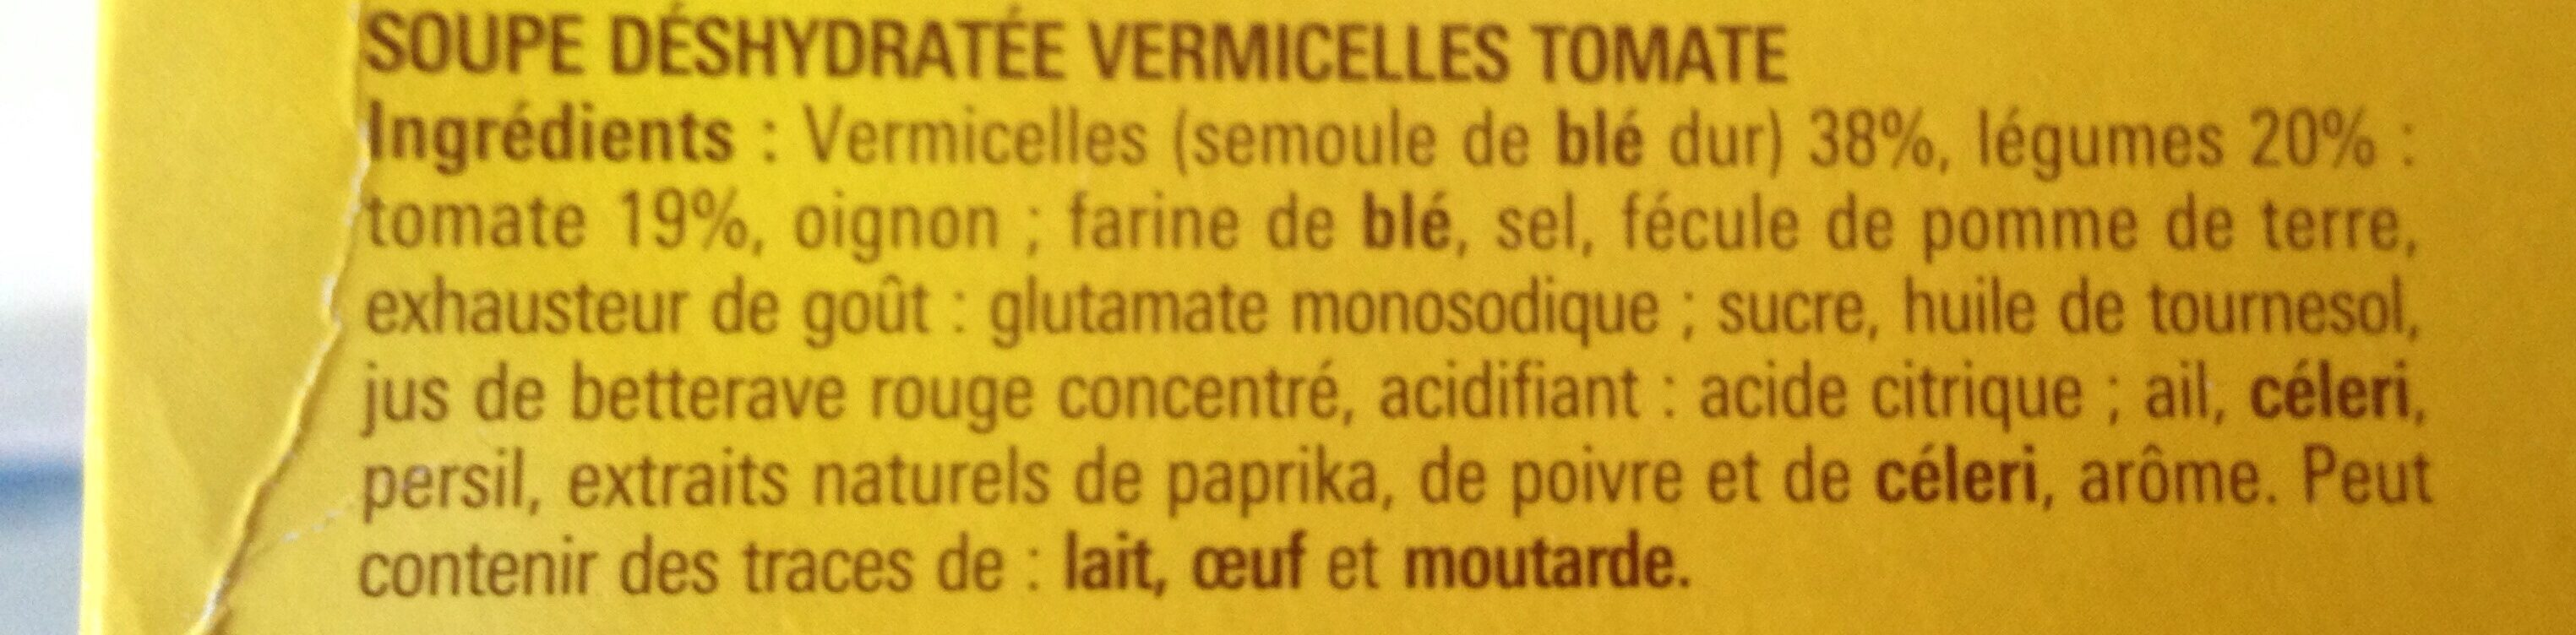 Maggi soupe de tomate aux vermicelles - Ingrediënten